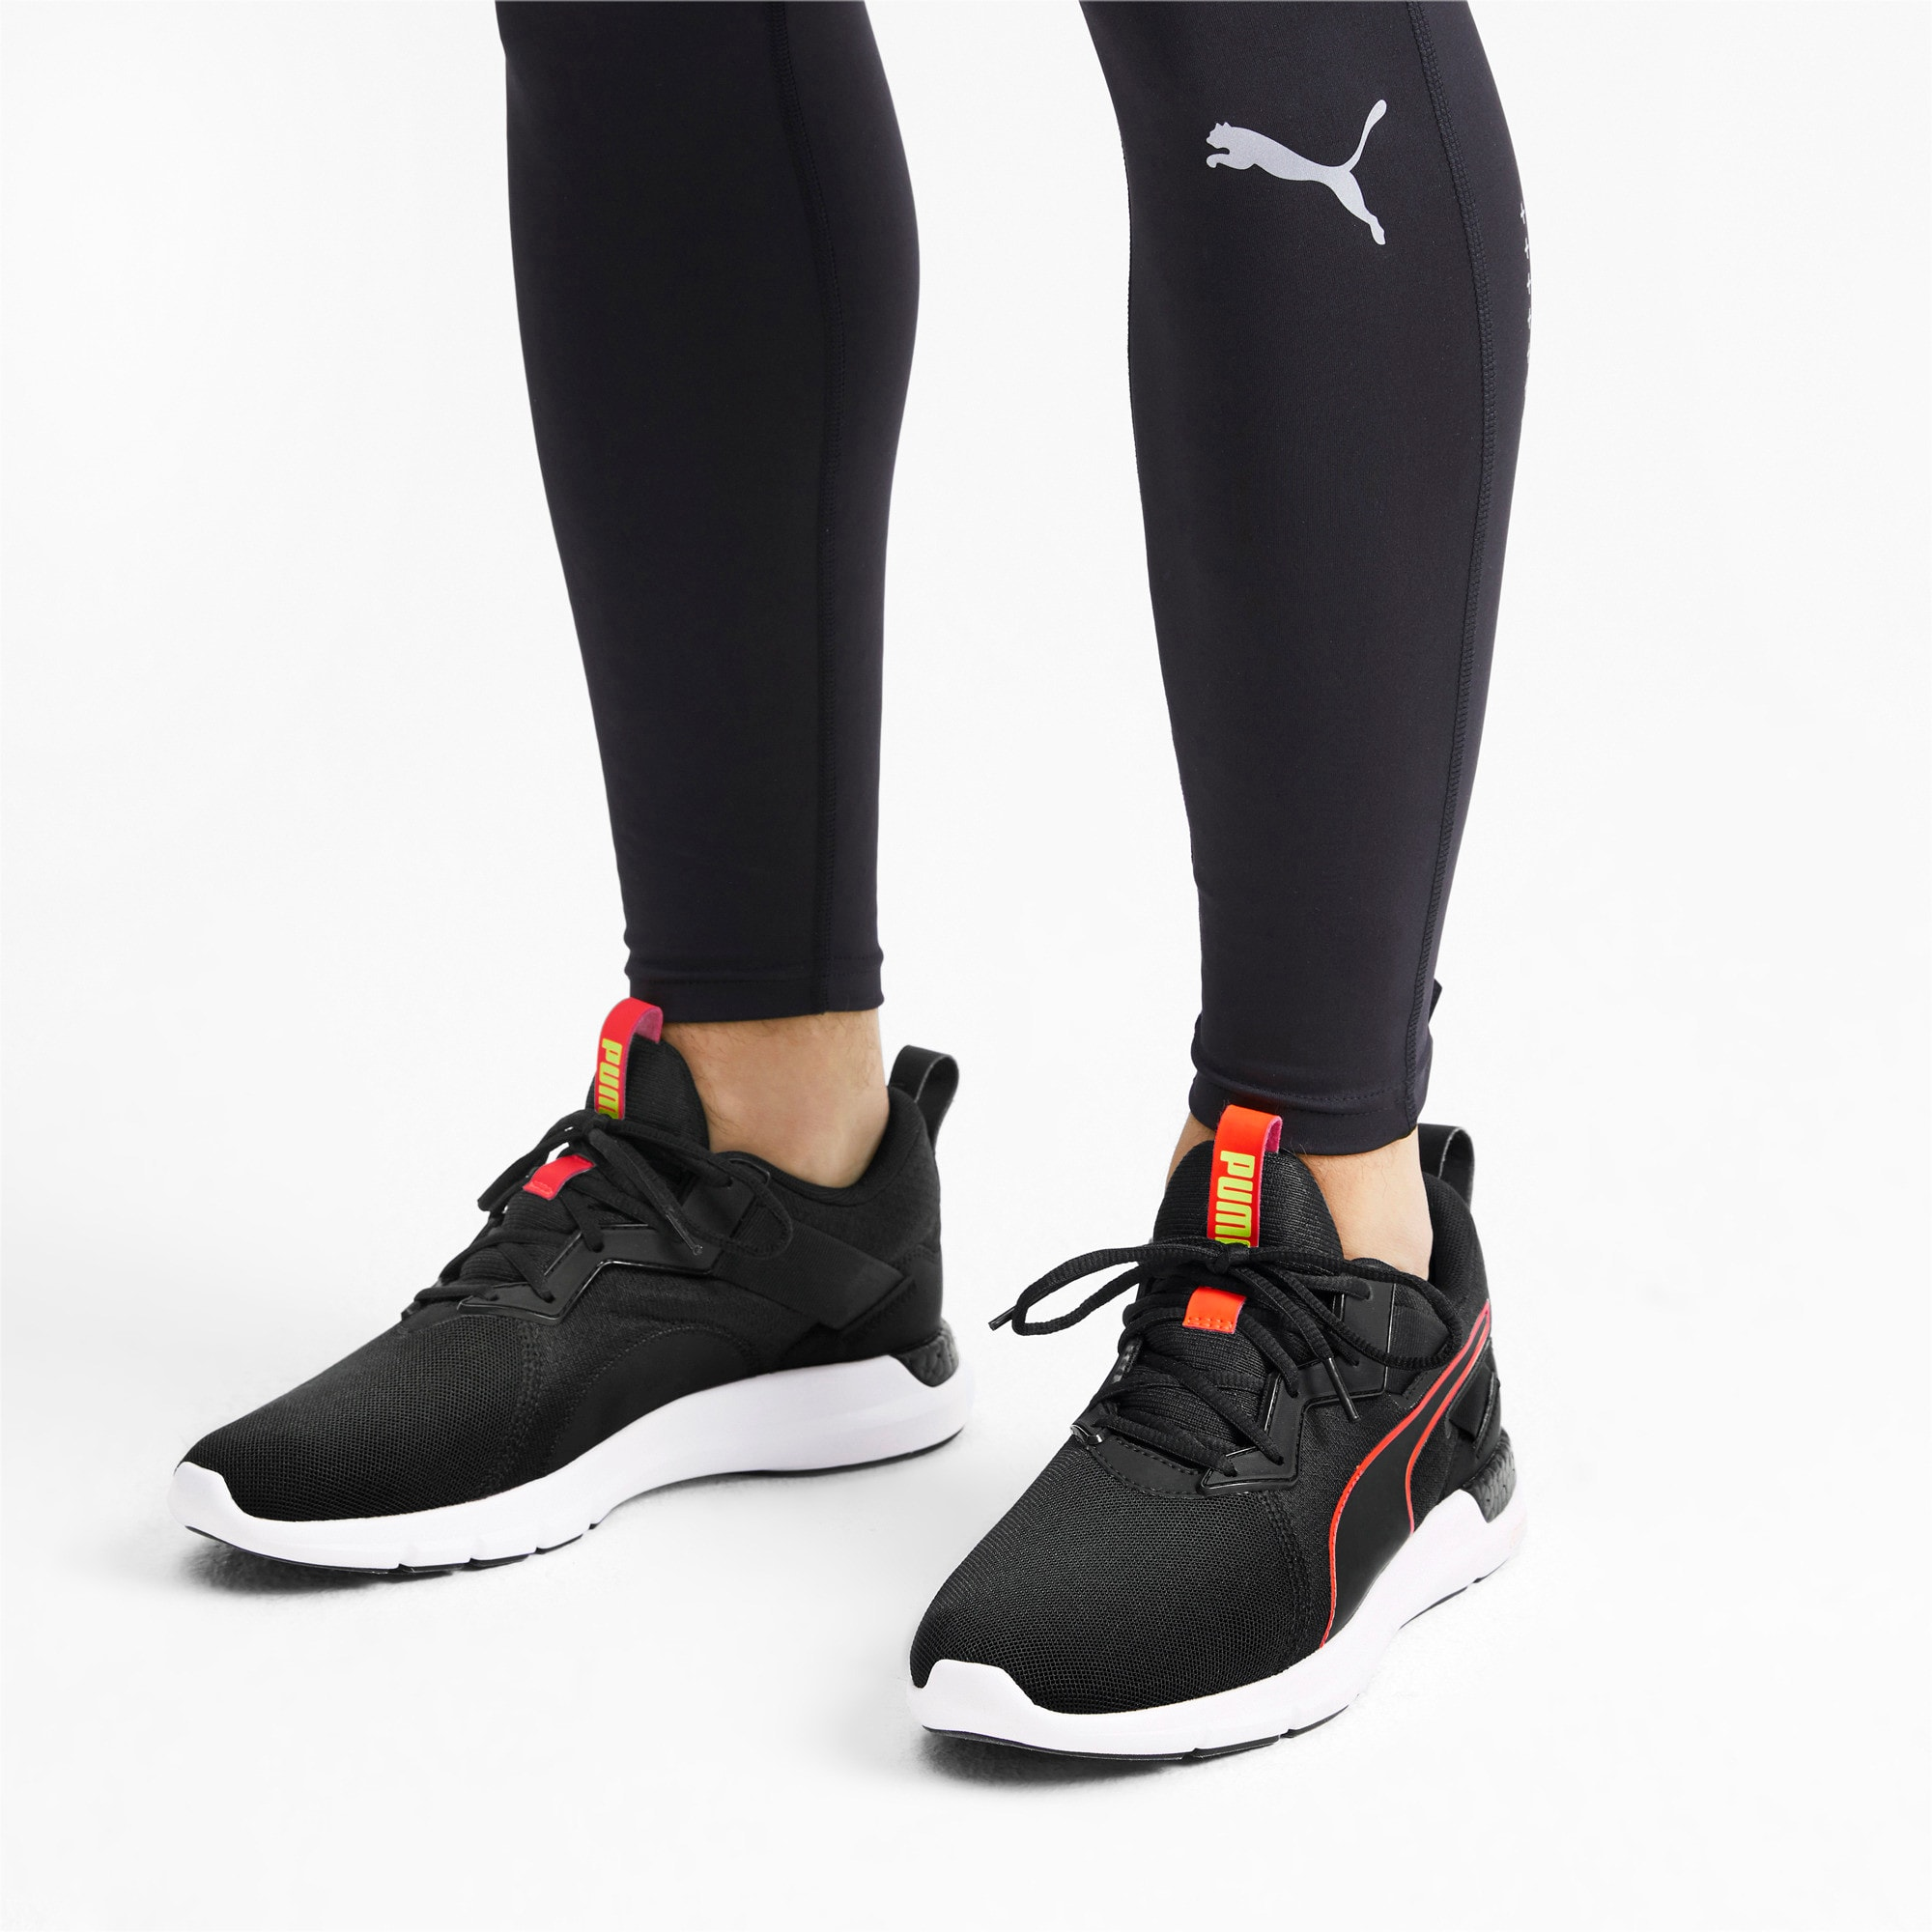 Thumbnail 3 of NRGY Dynamo Futuro Men's Running Shoes, Puma Black-Nrgy Red, medium